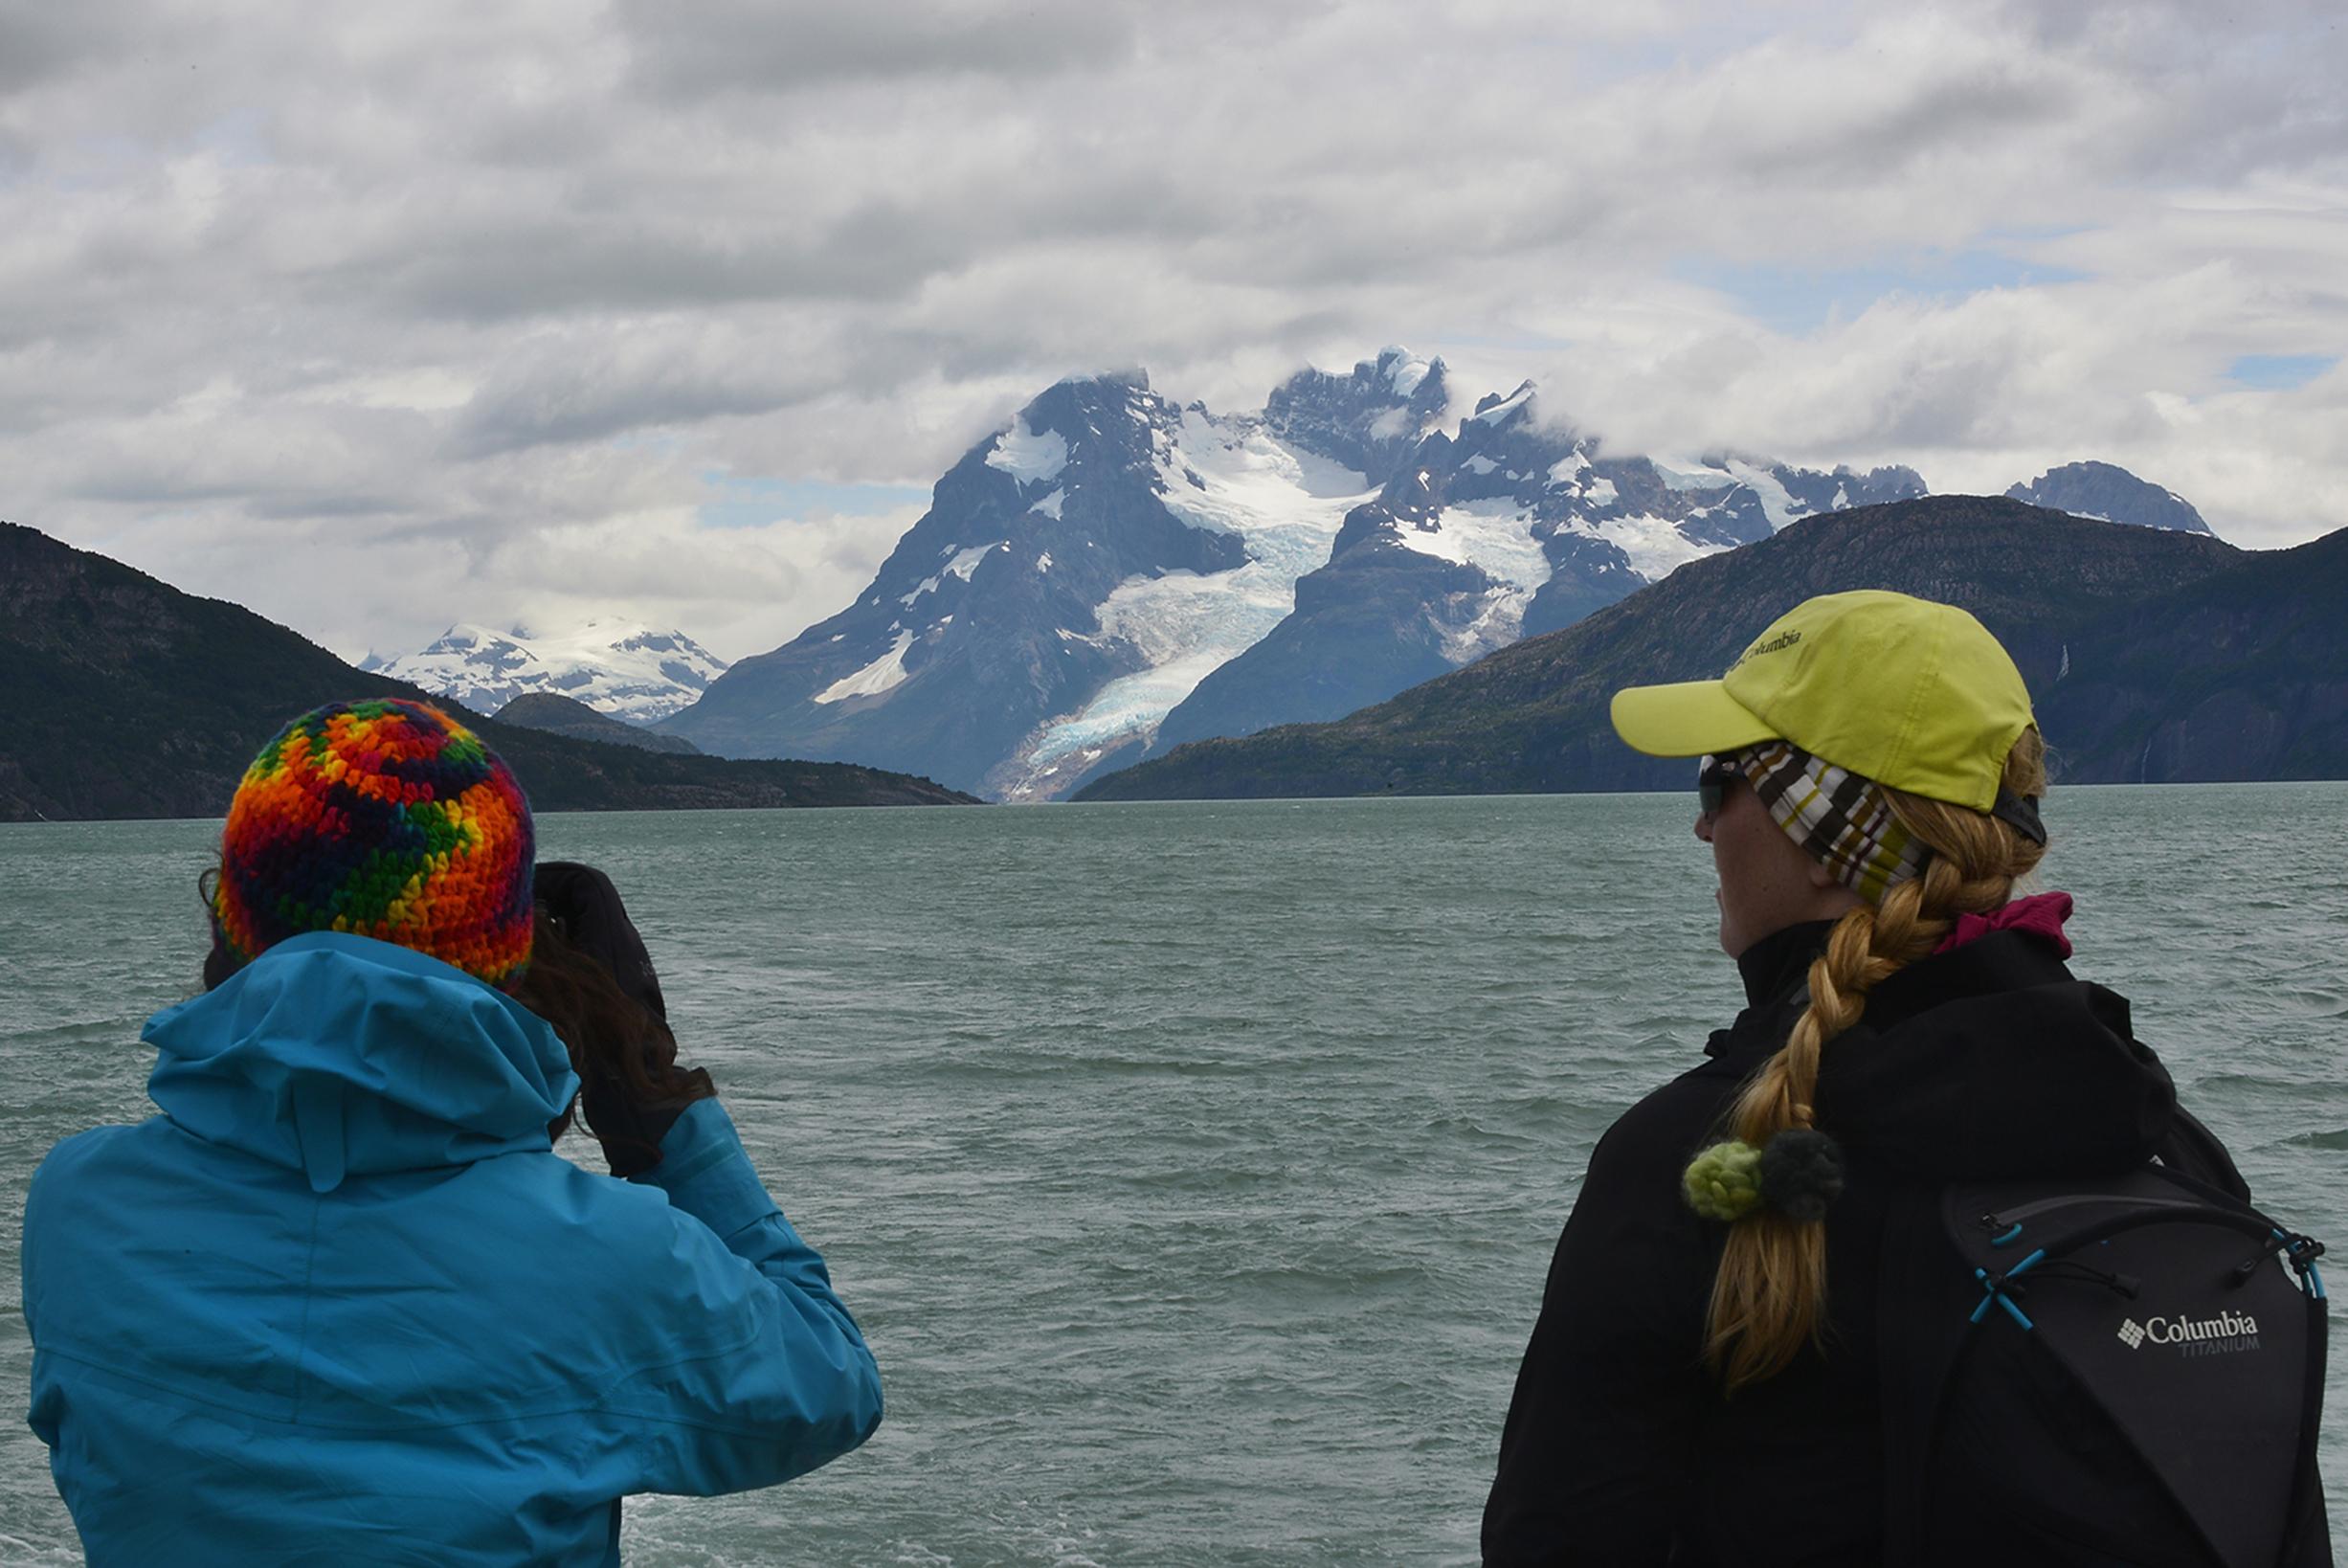 Santiago, Laguna San Rafael y Torres del Paine